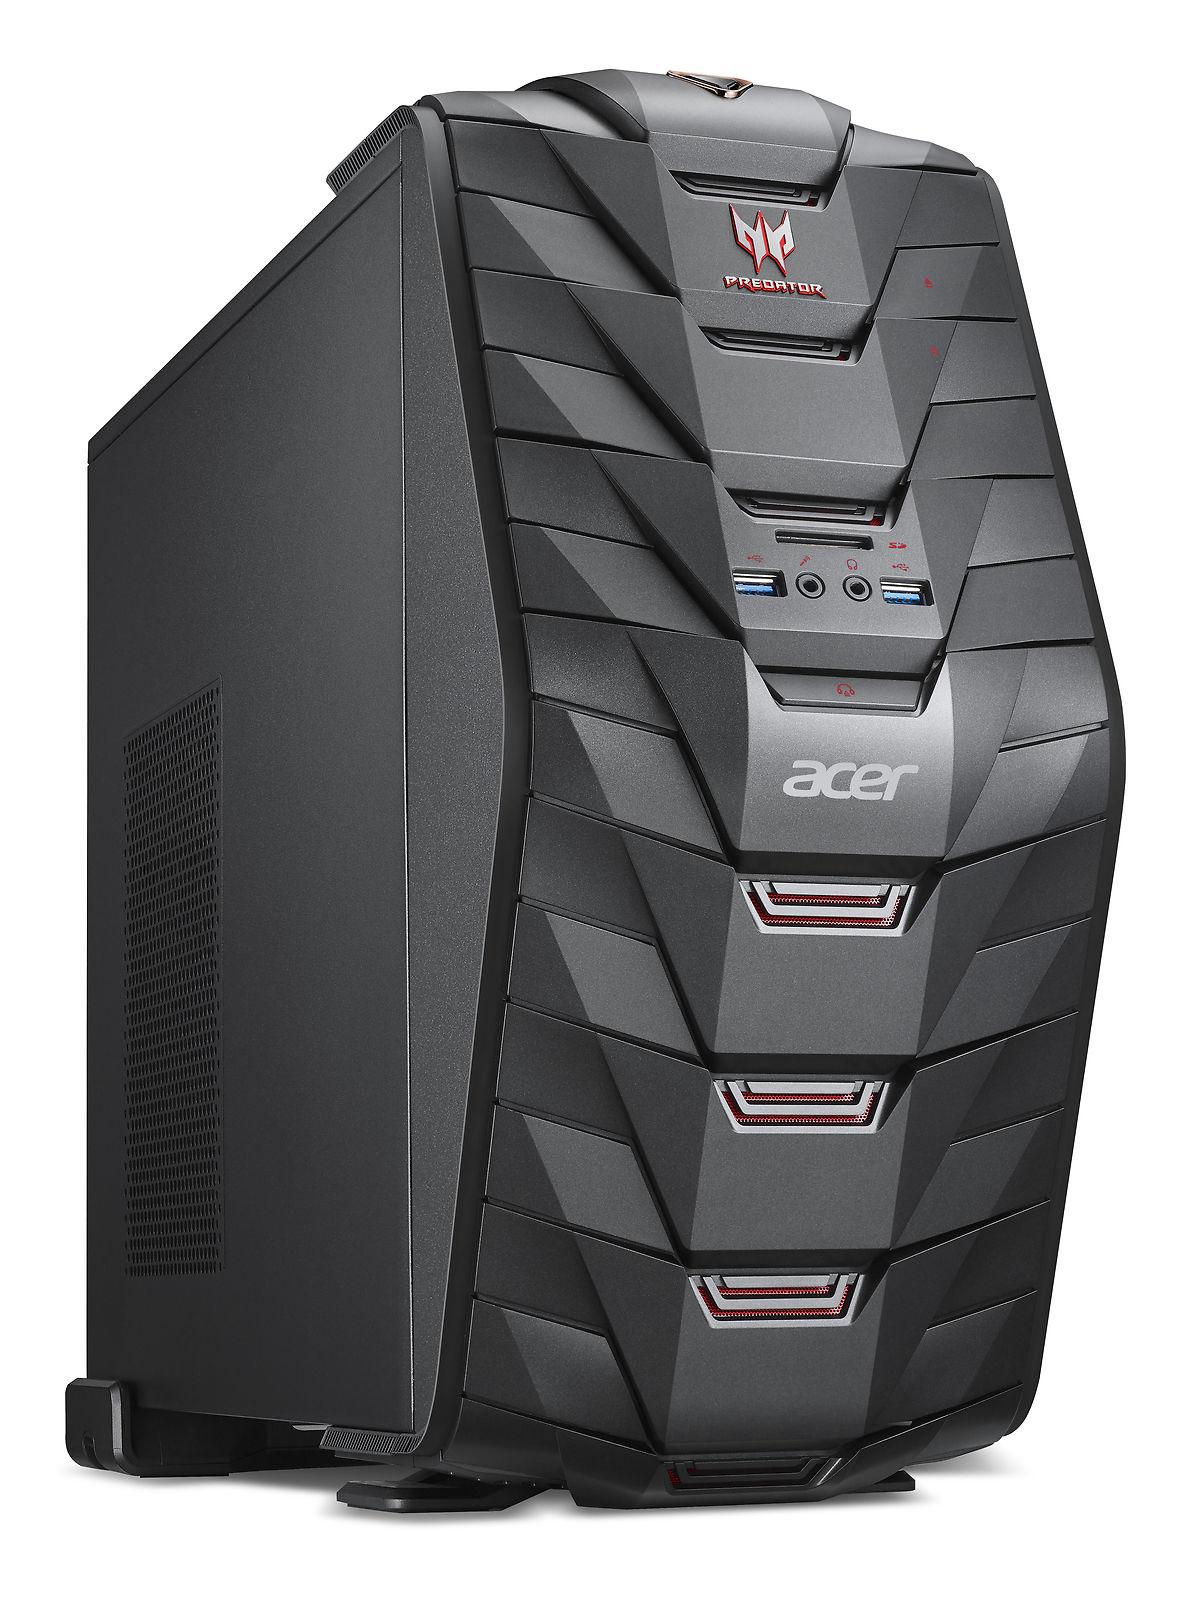 Acer Intel Core i7 7700 , GTX 1070, 32 GB Ram, 1 TB HDD + 256 GB SSD $1092